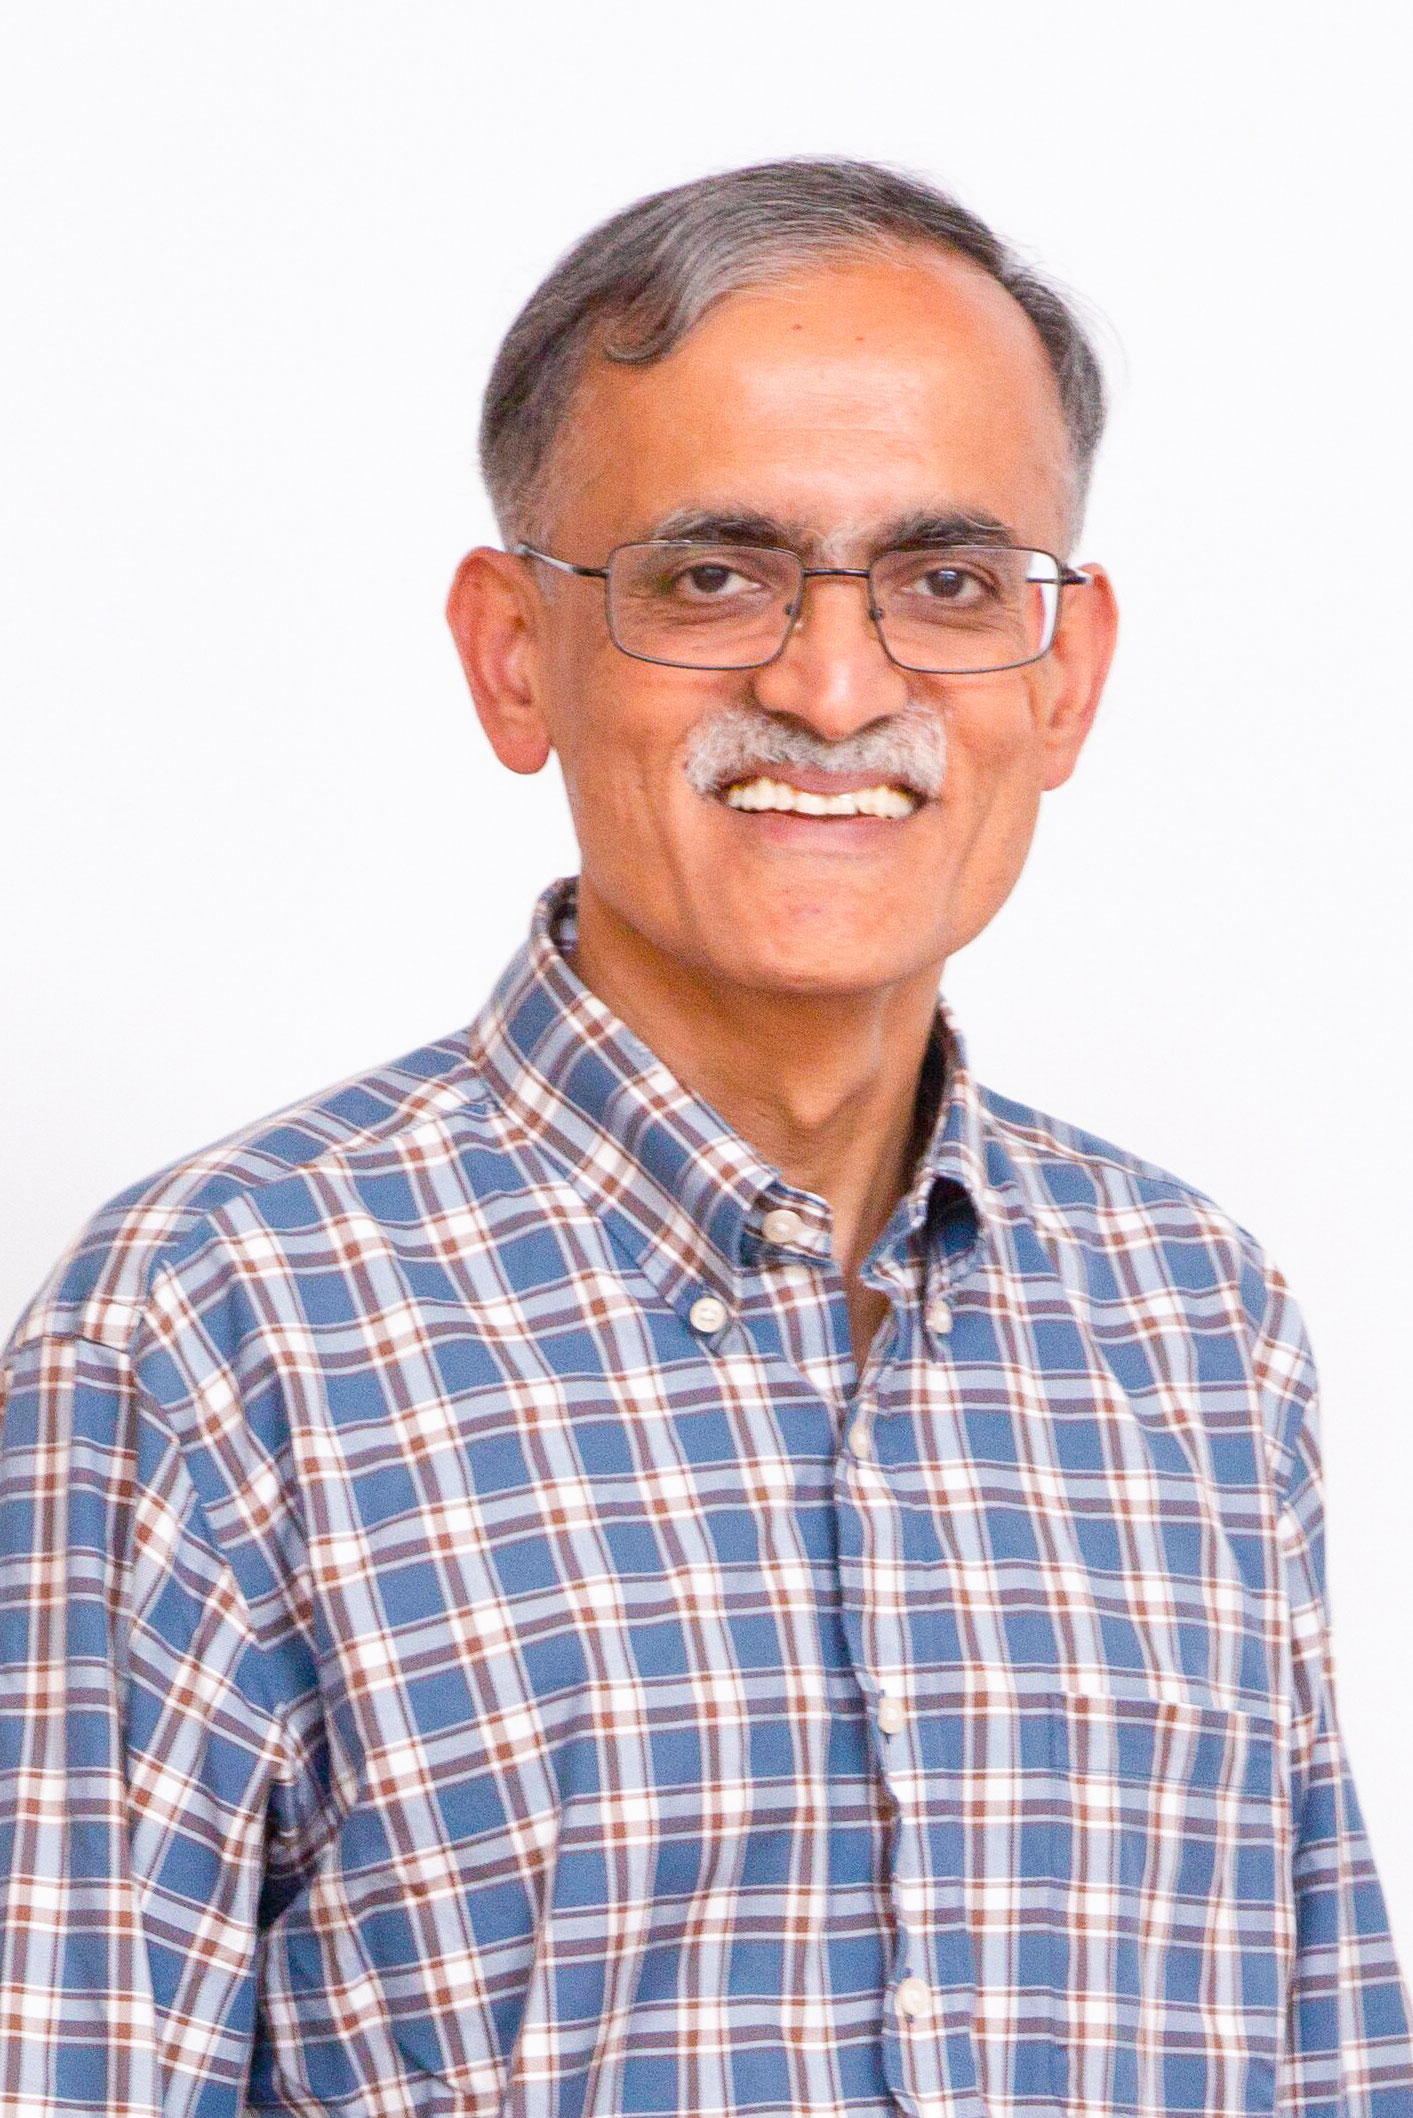 Dr. C. NatarajArtificial IntelligenceProfessor, Scientist & Engineer, Artificial Intelligence Lead -